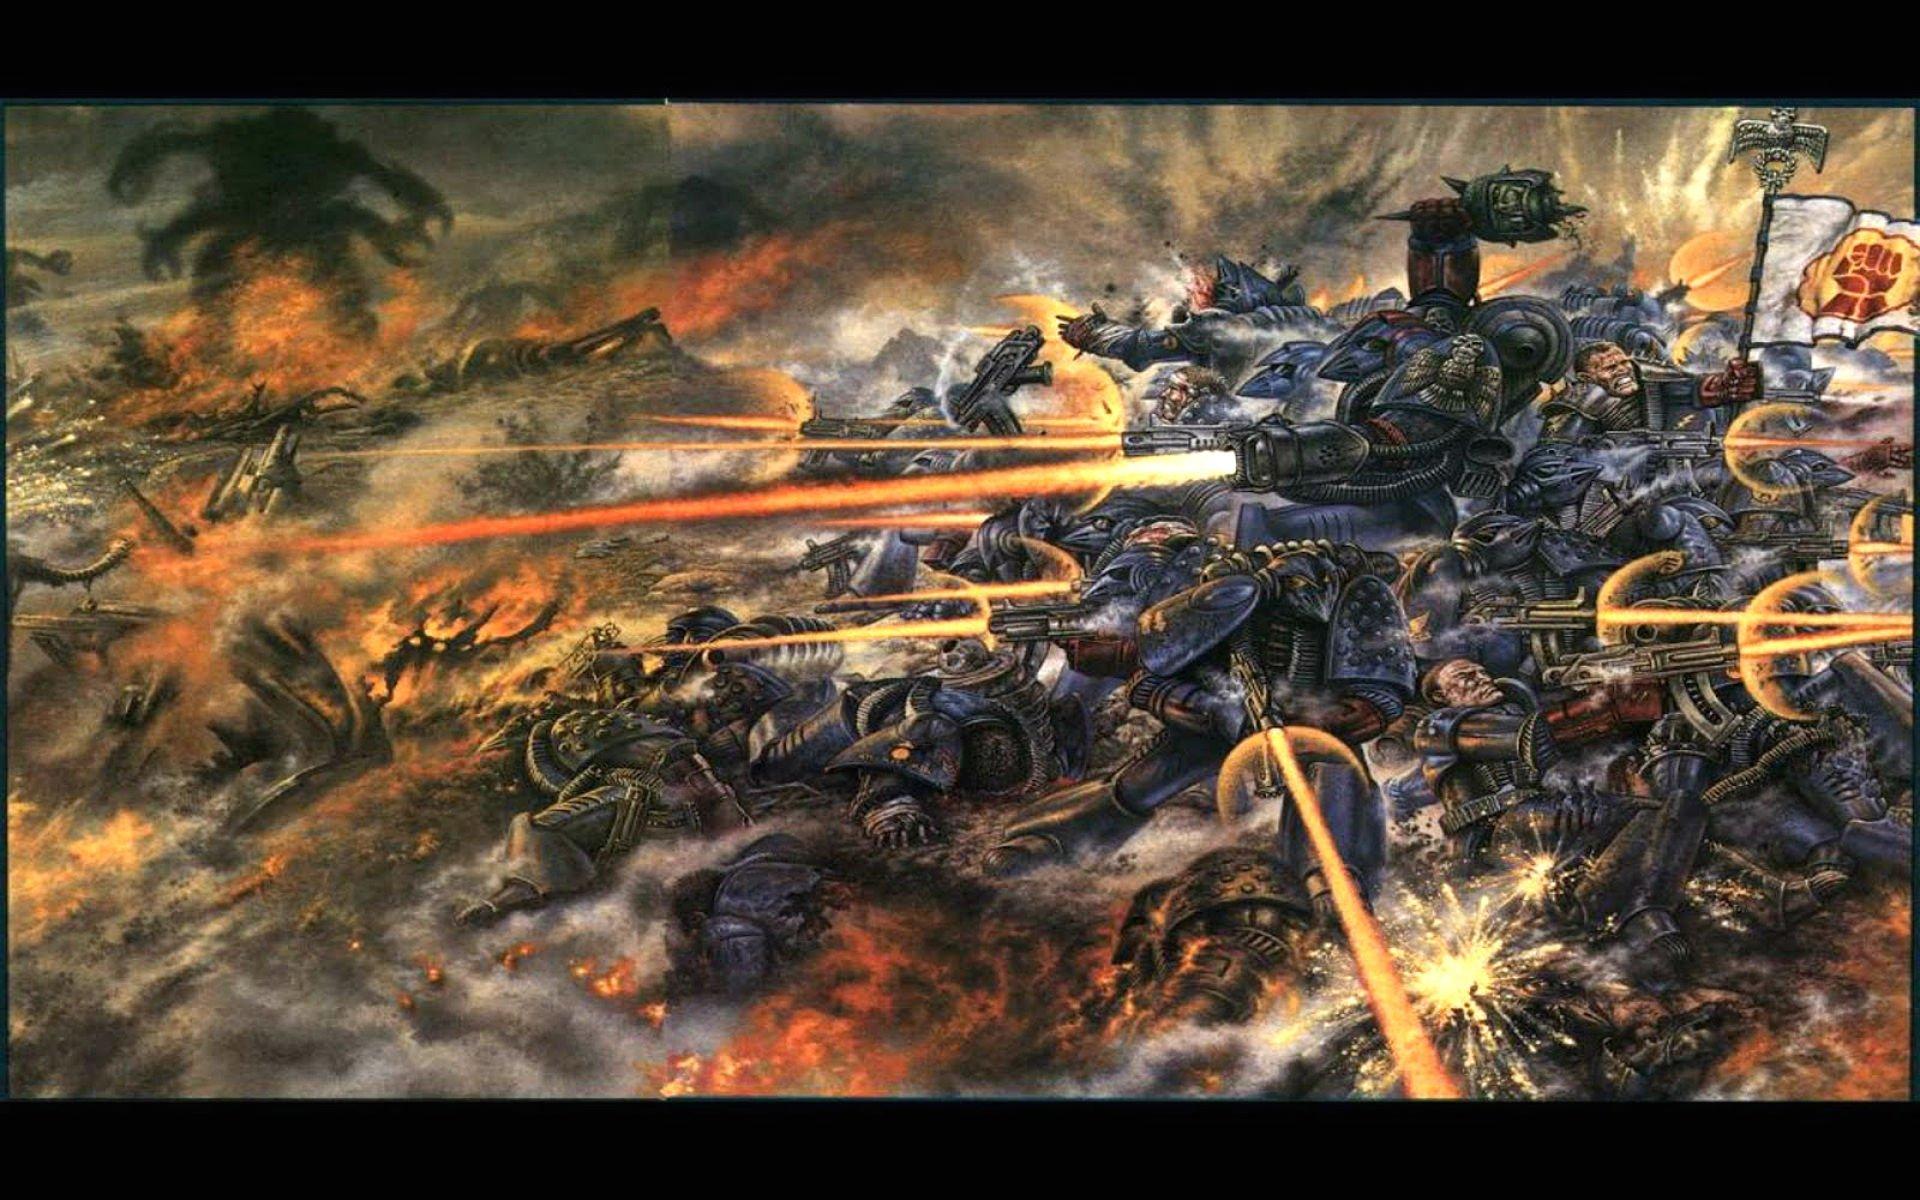 epic star wars battle wallpapers